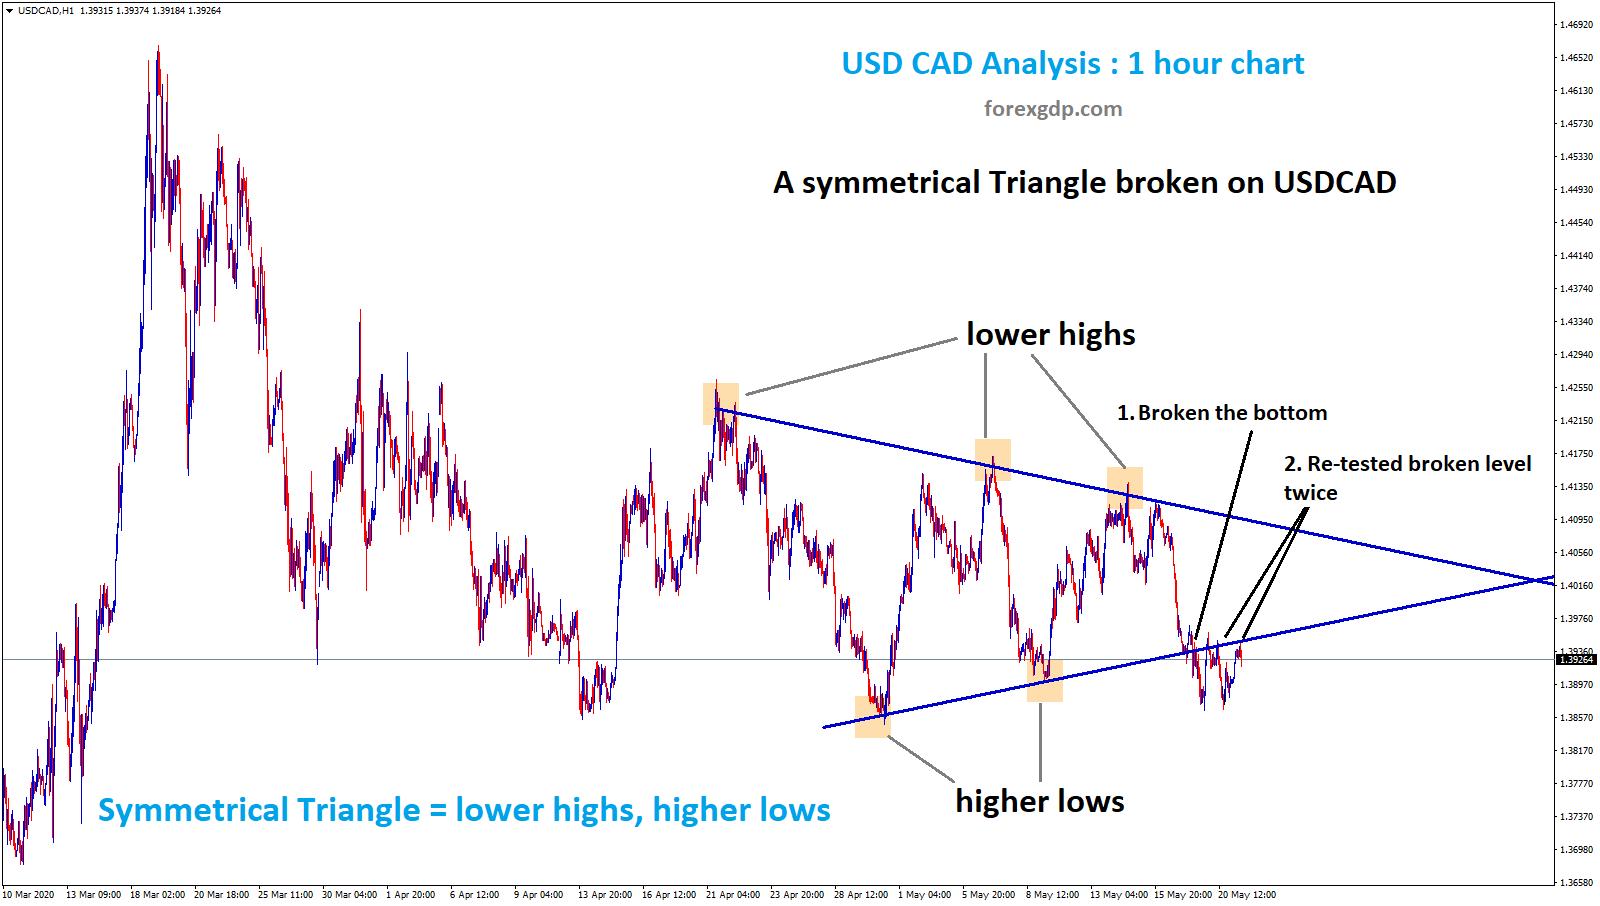 Symmetrical triangle broken on USCAD 1 hr chart